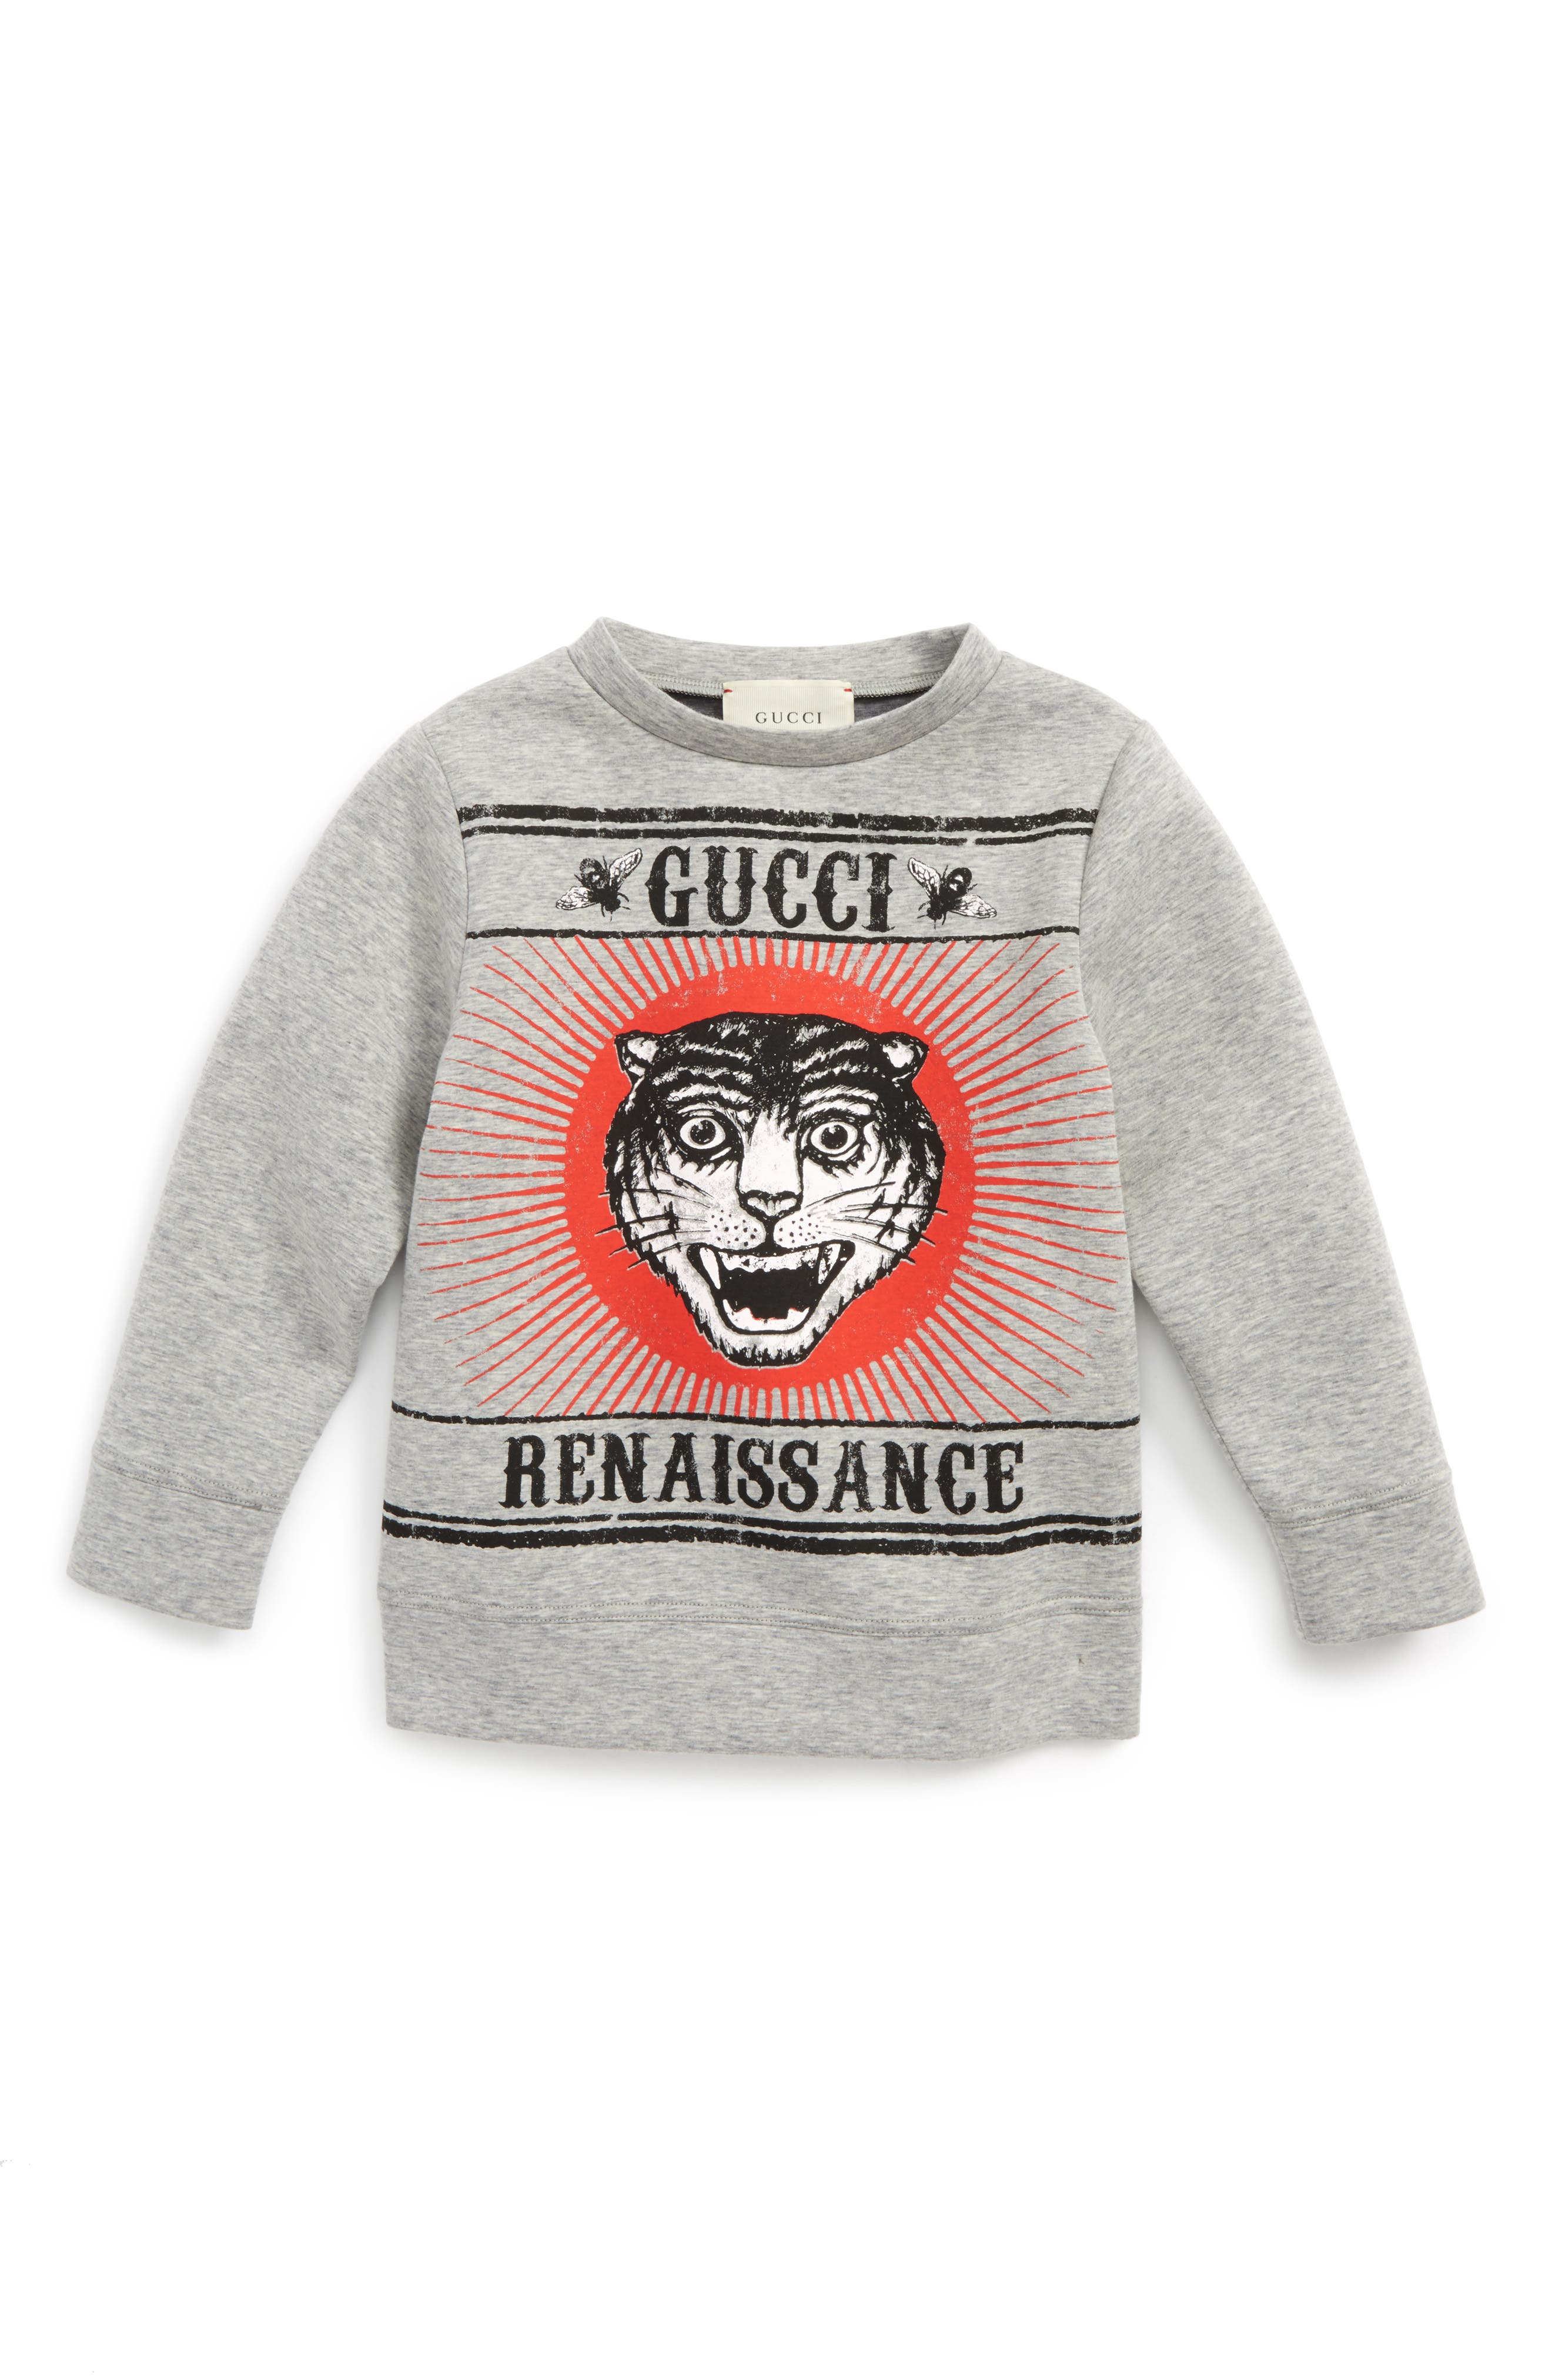 Alternate Image 1 Selected - Gucci Tiger Graphic Sweatshirt (Little Boys & Big Boys)